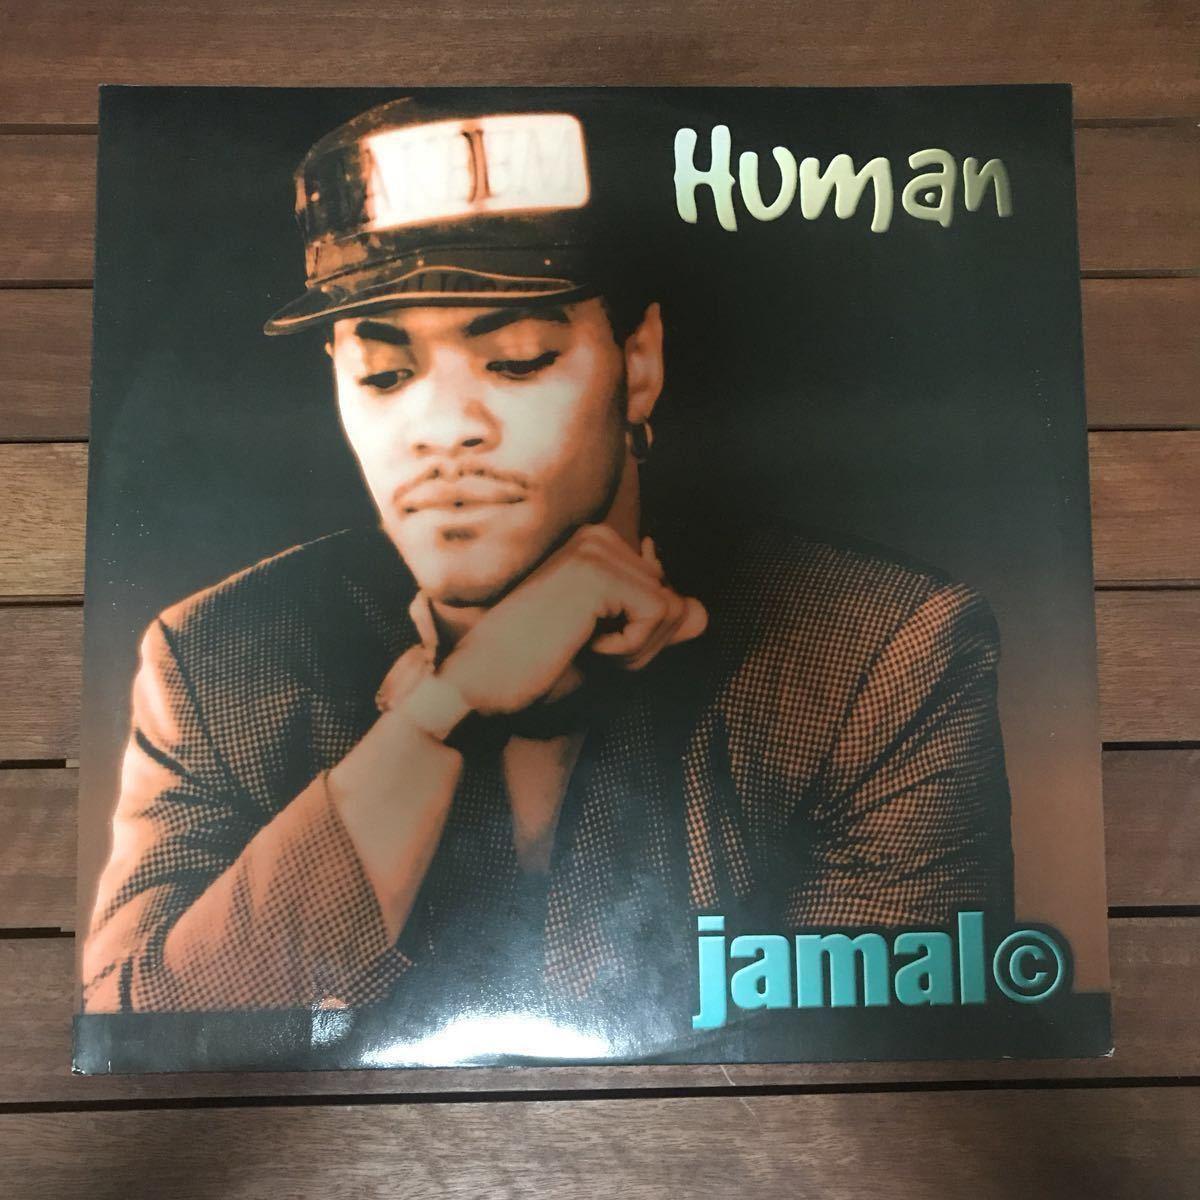 《☆》【eu-rap】Jamal C / Human [12inch]オリジナル盤《4-1-22》